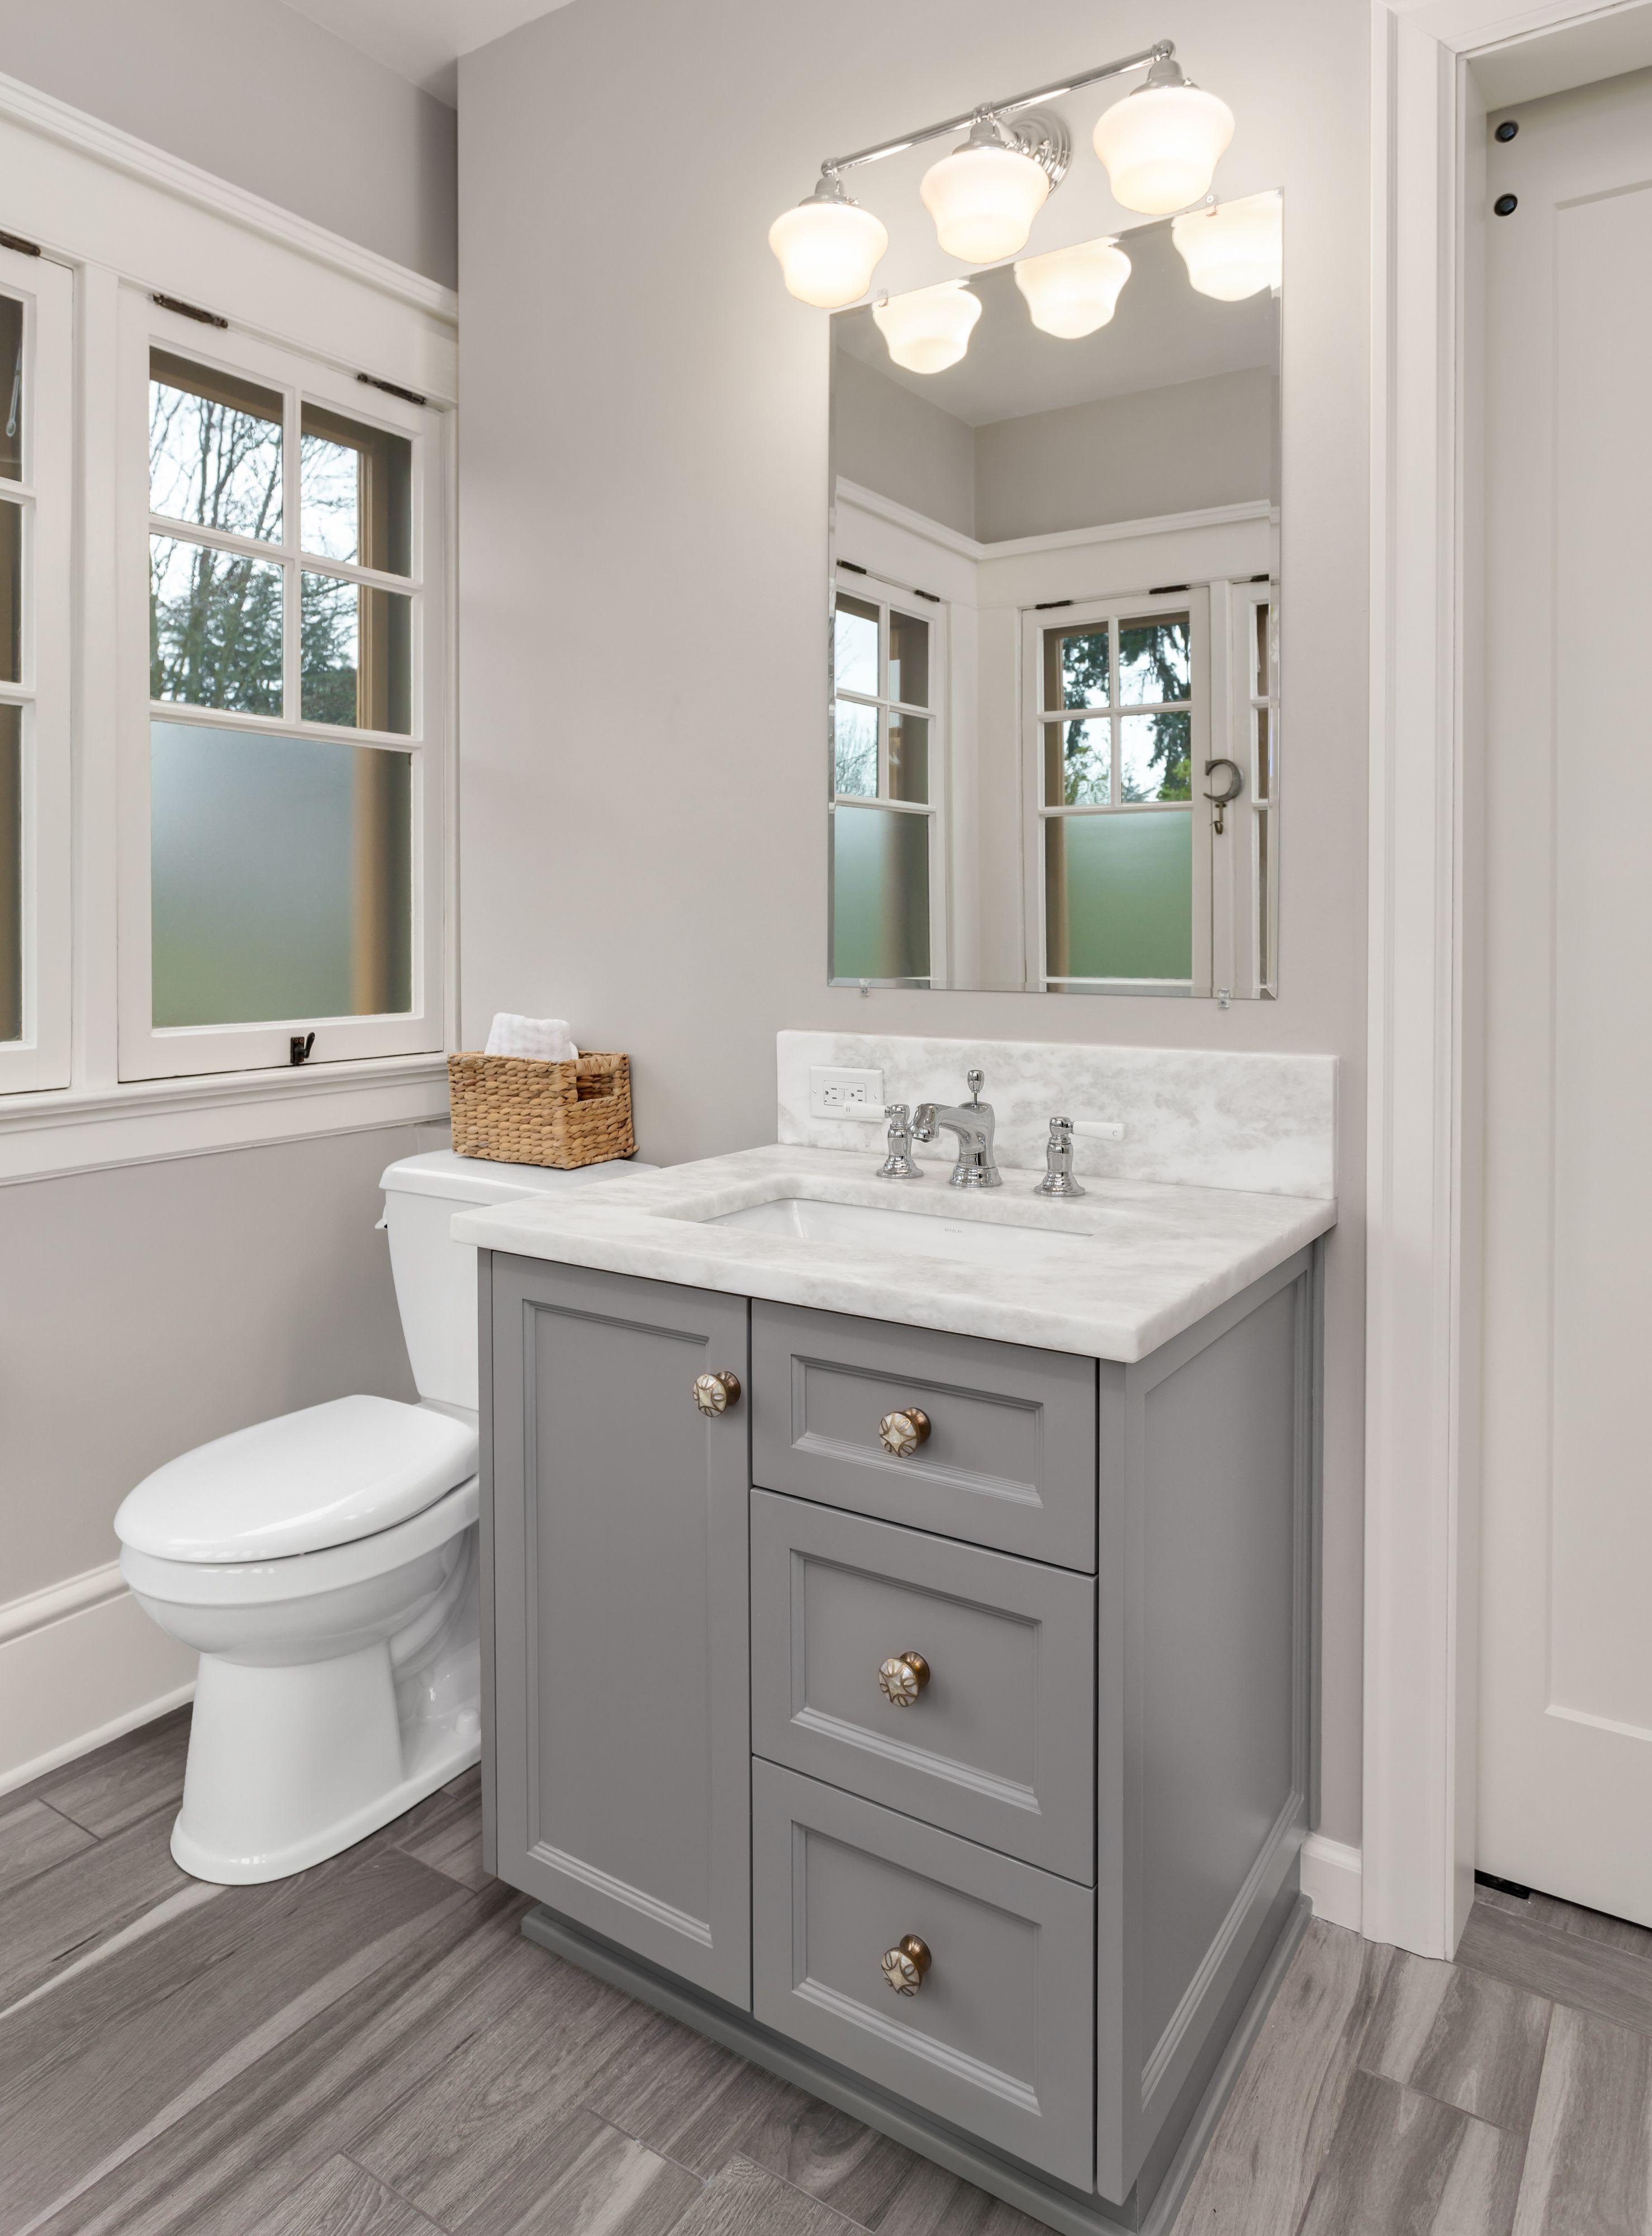 Full Bath Remodel Restroom Remodel Small Bathroom Vanities Small Bathroom Renos